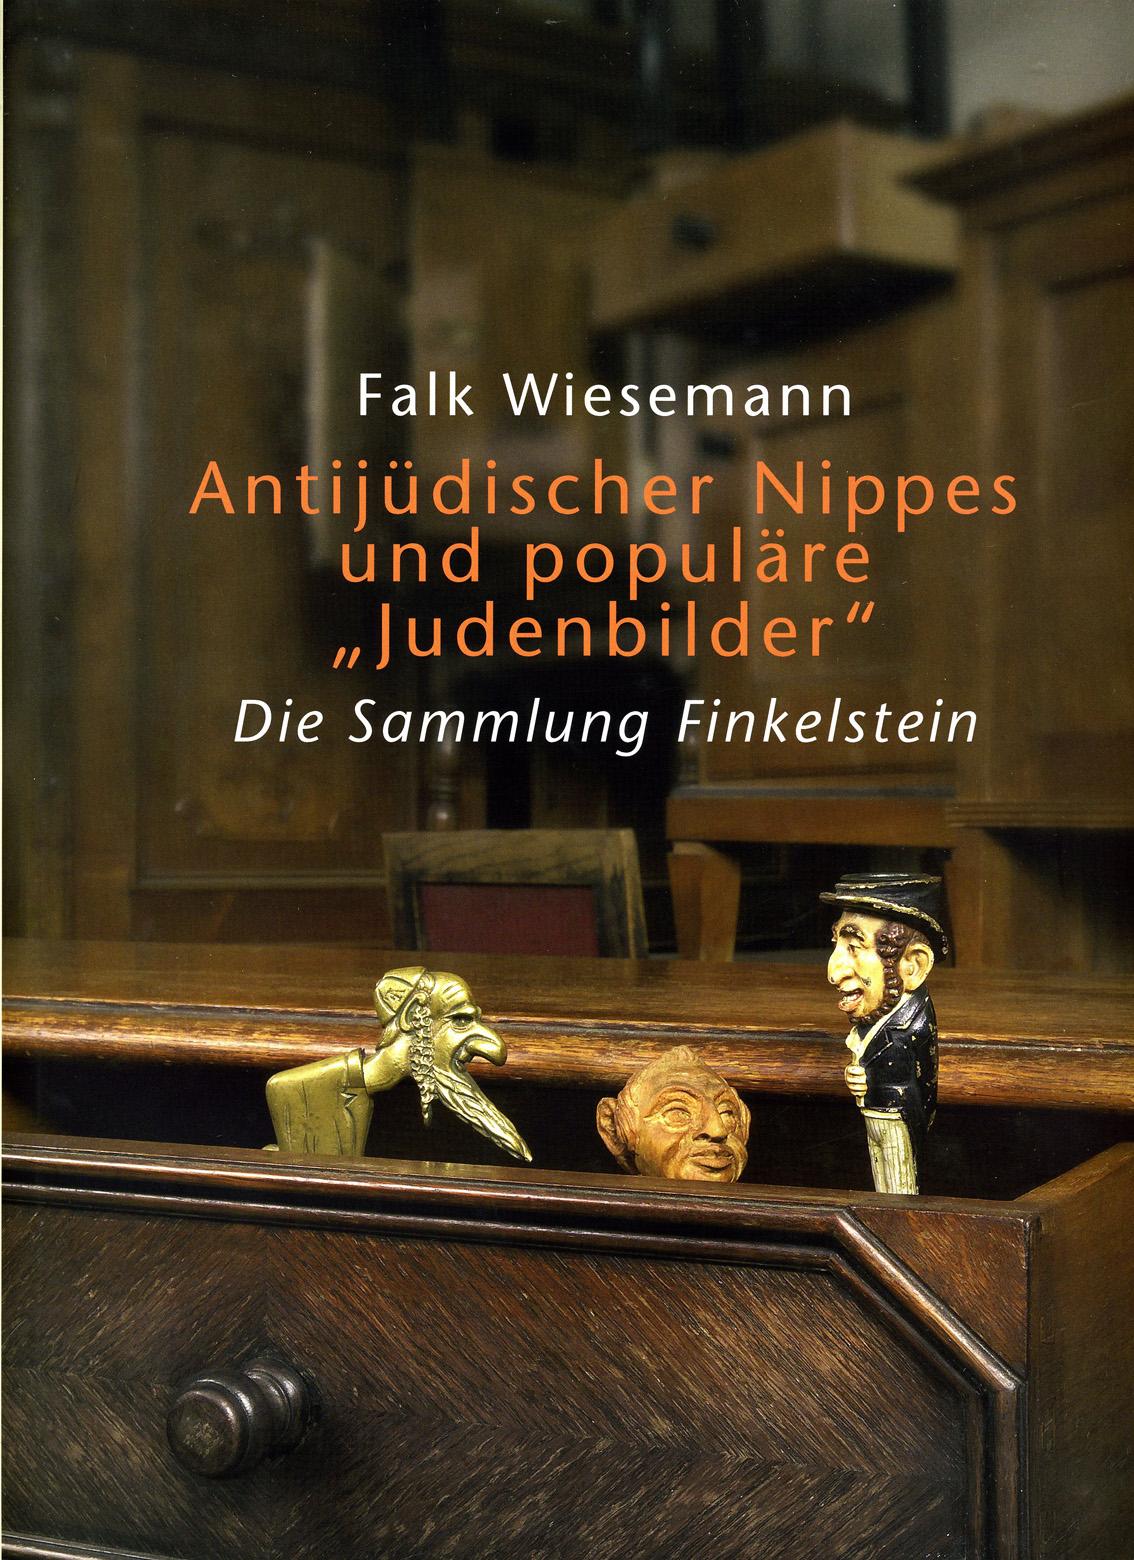 Publikation Antijuedischer Nippes